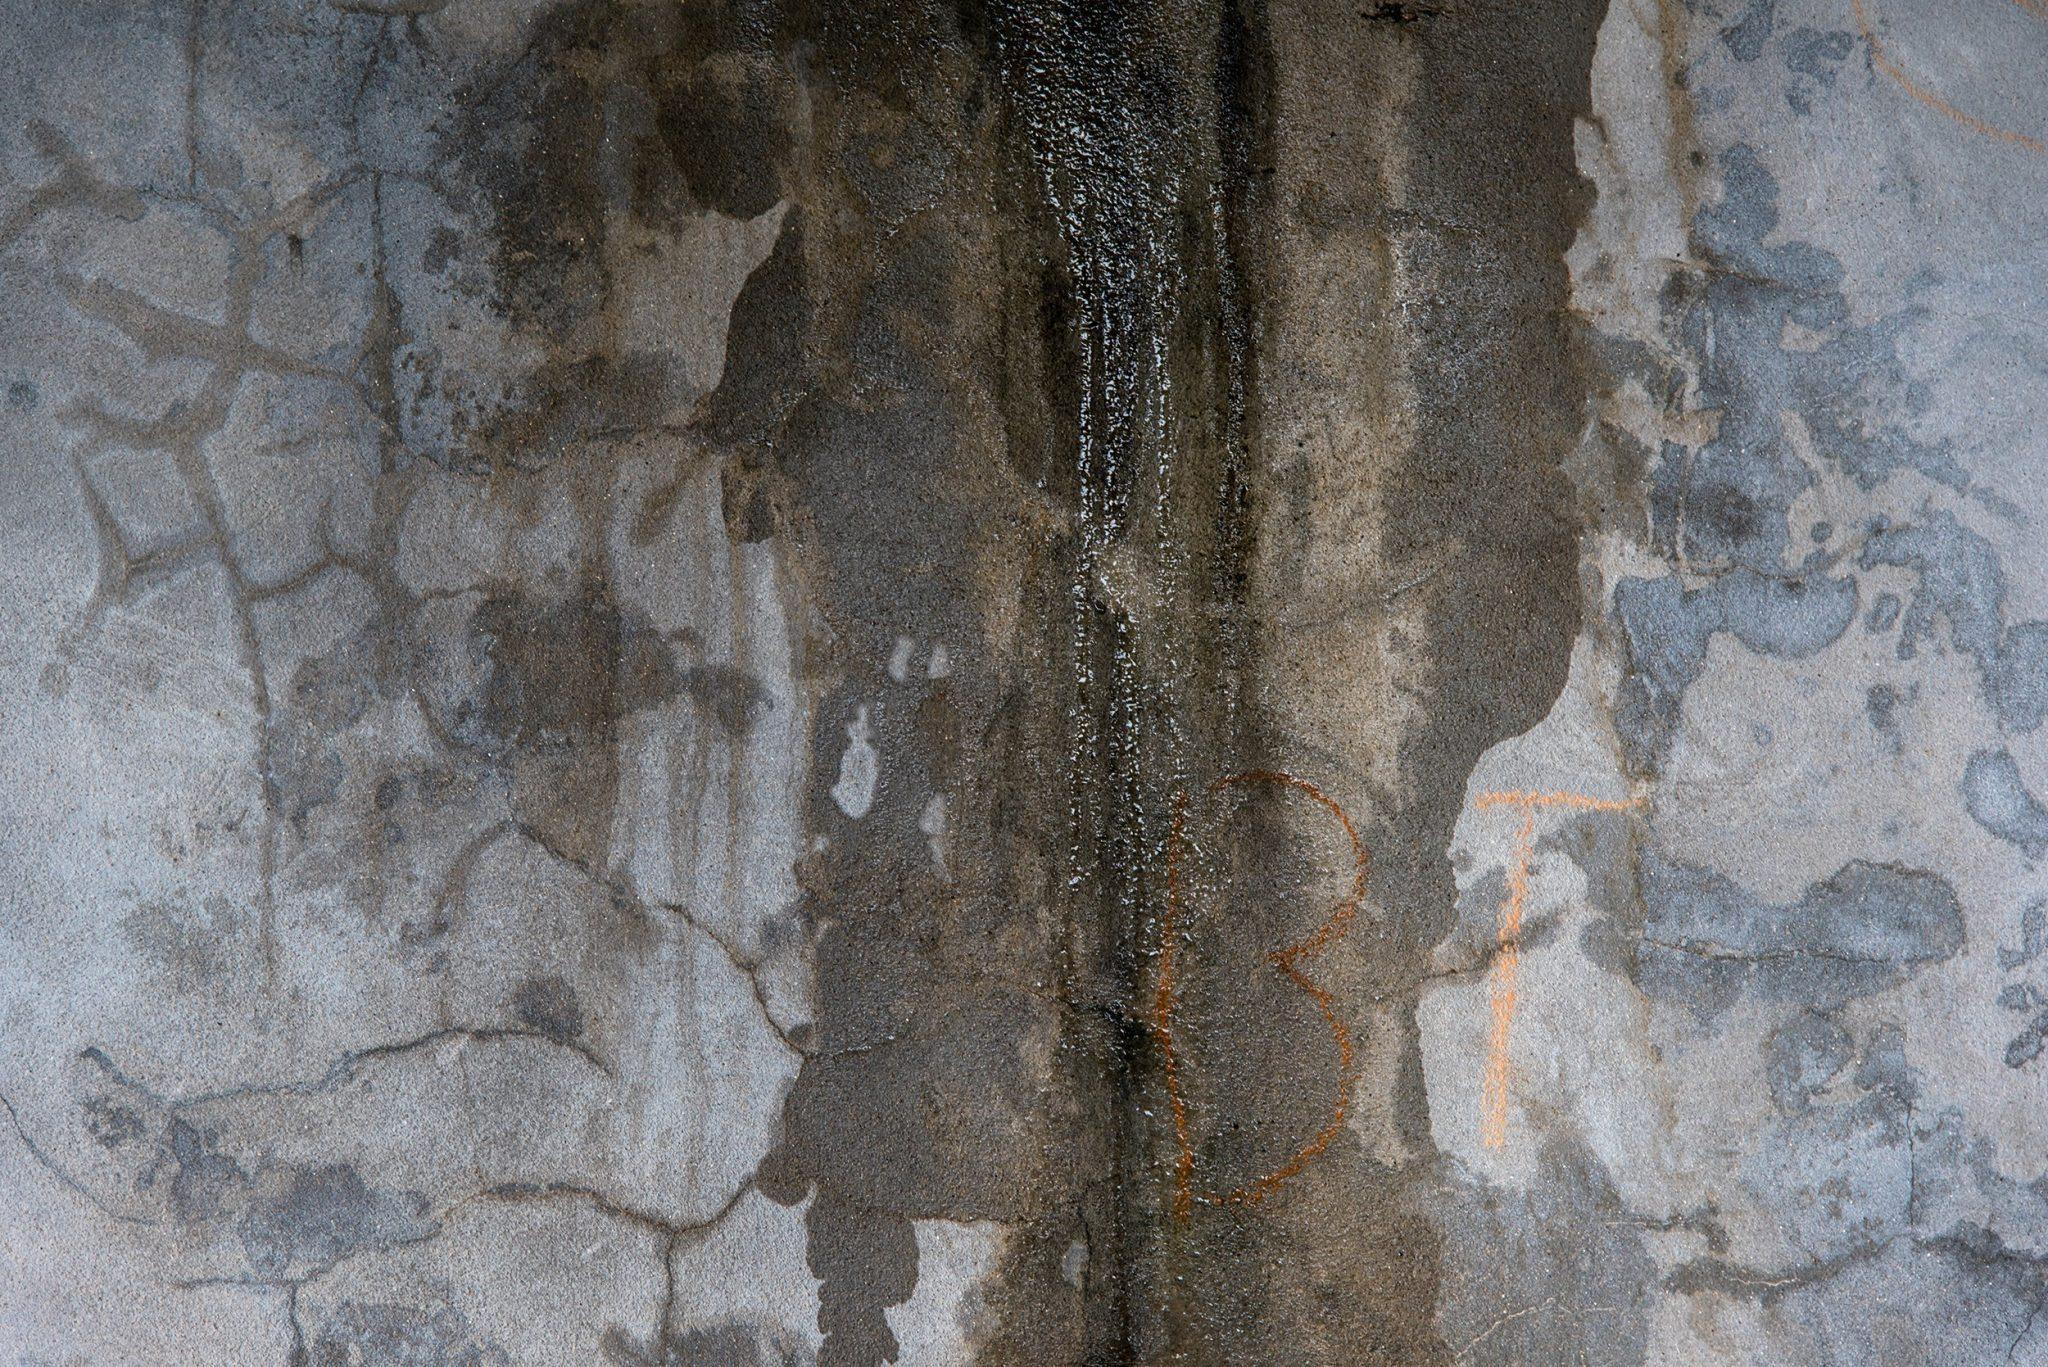 Slab Leak Detection | Slab Leak